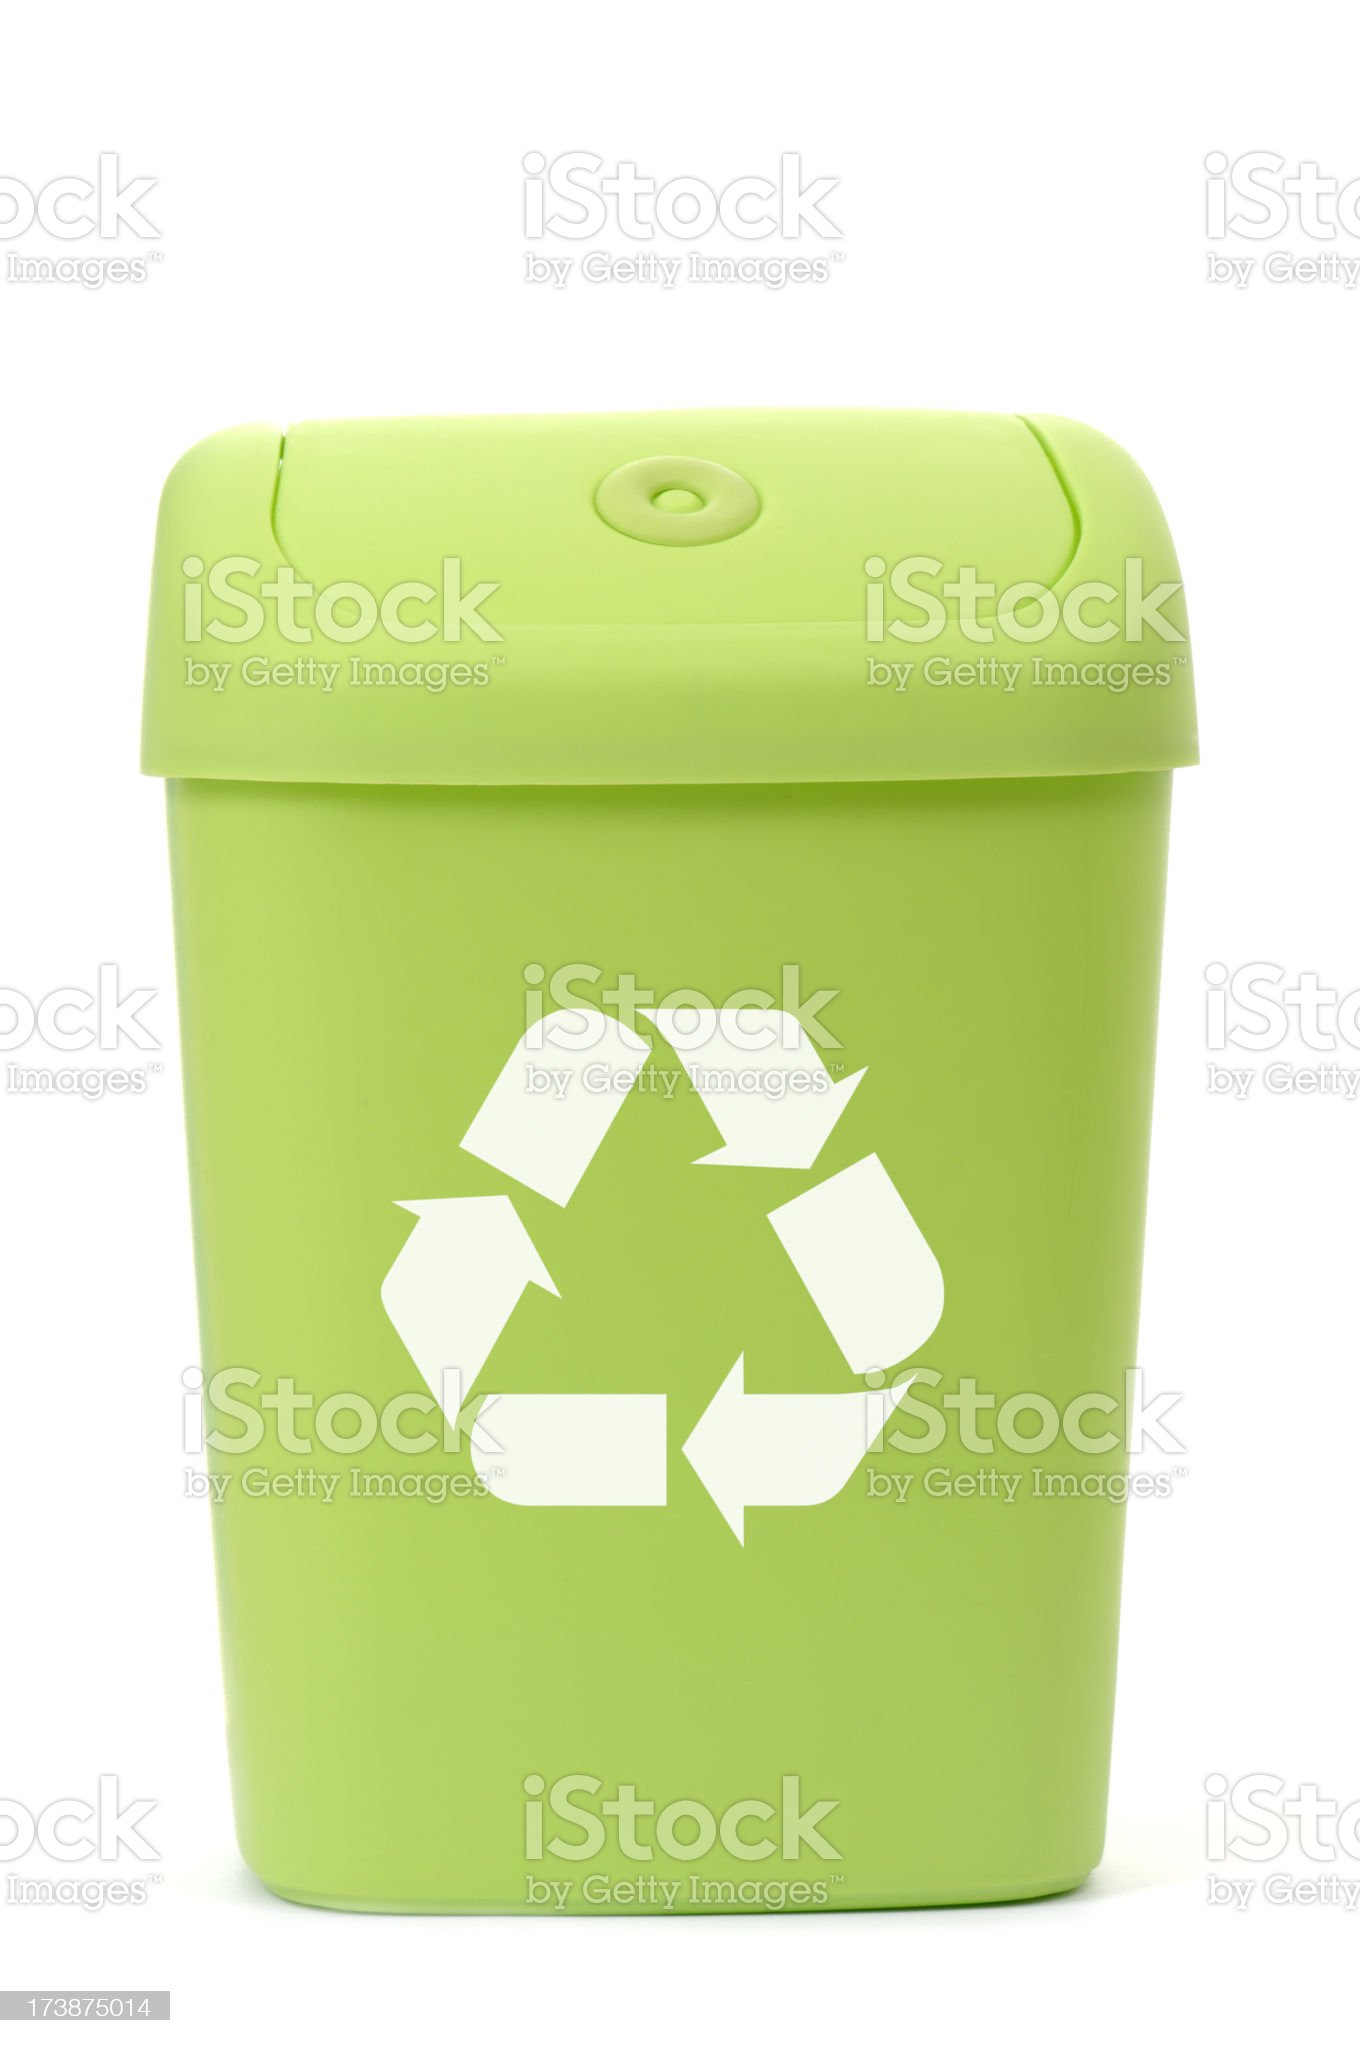 Green Recycling bin royalty-free stock photo